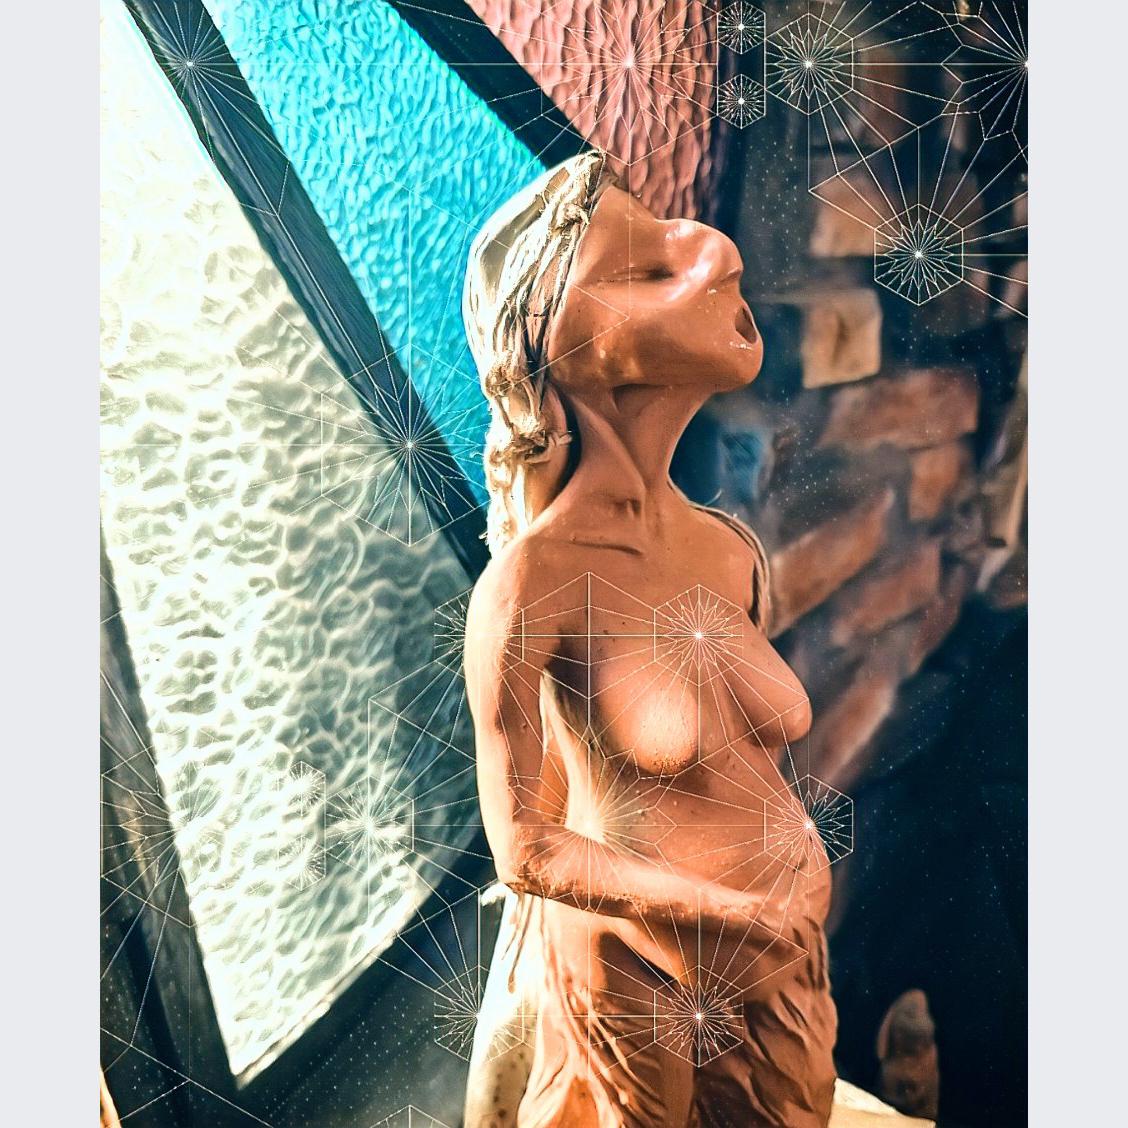 Flavia  Goellner - Título: Pachamama mirando janelas interiores - De dentro, o florescer